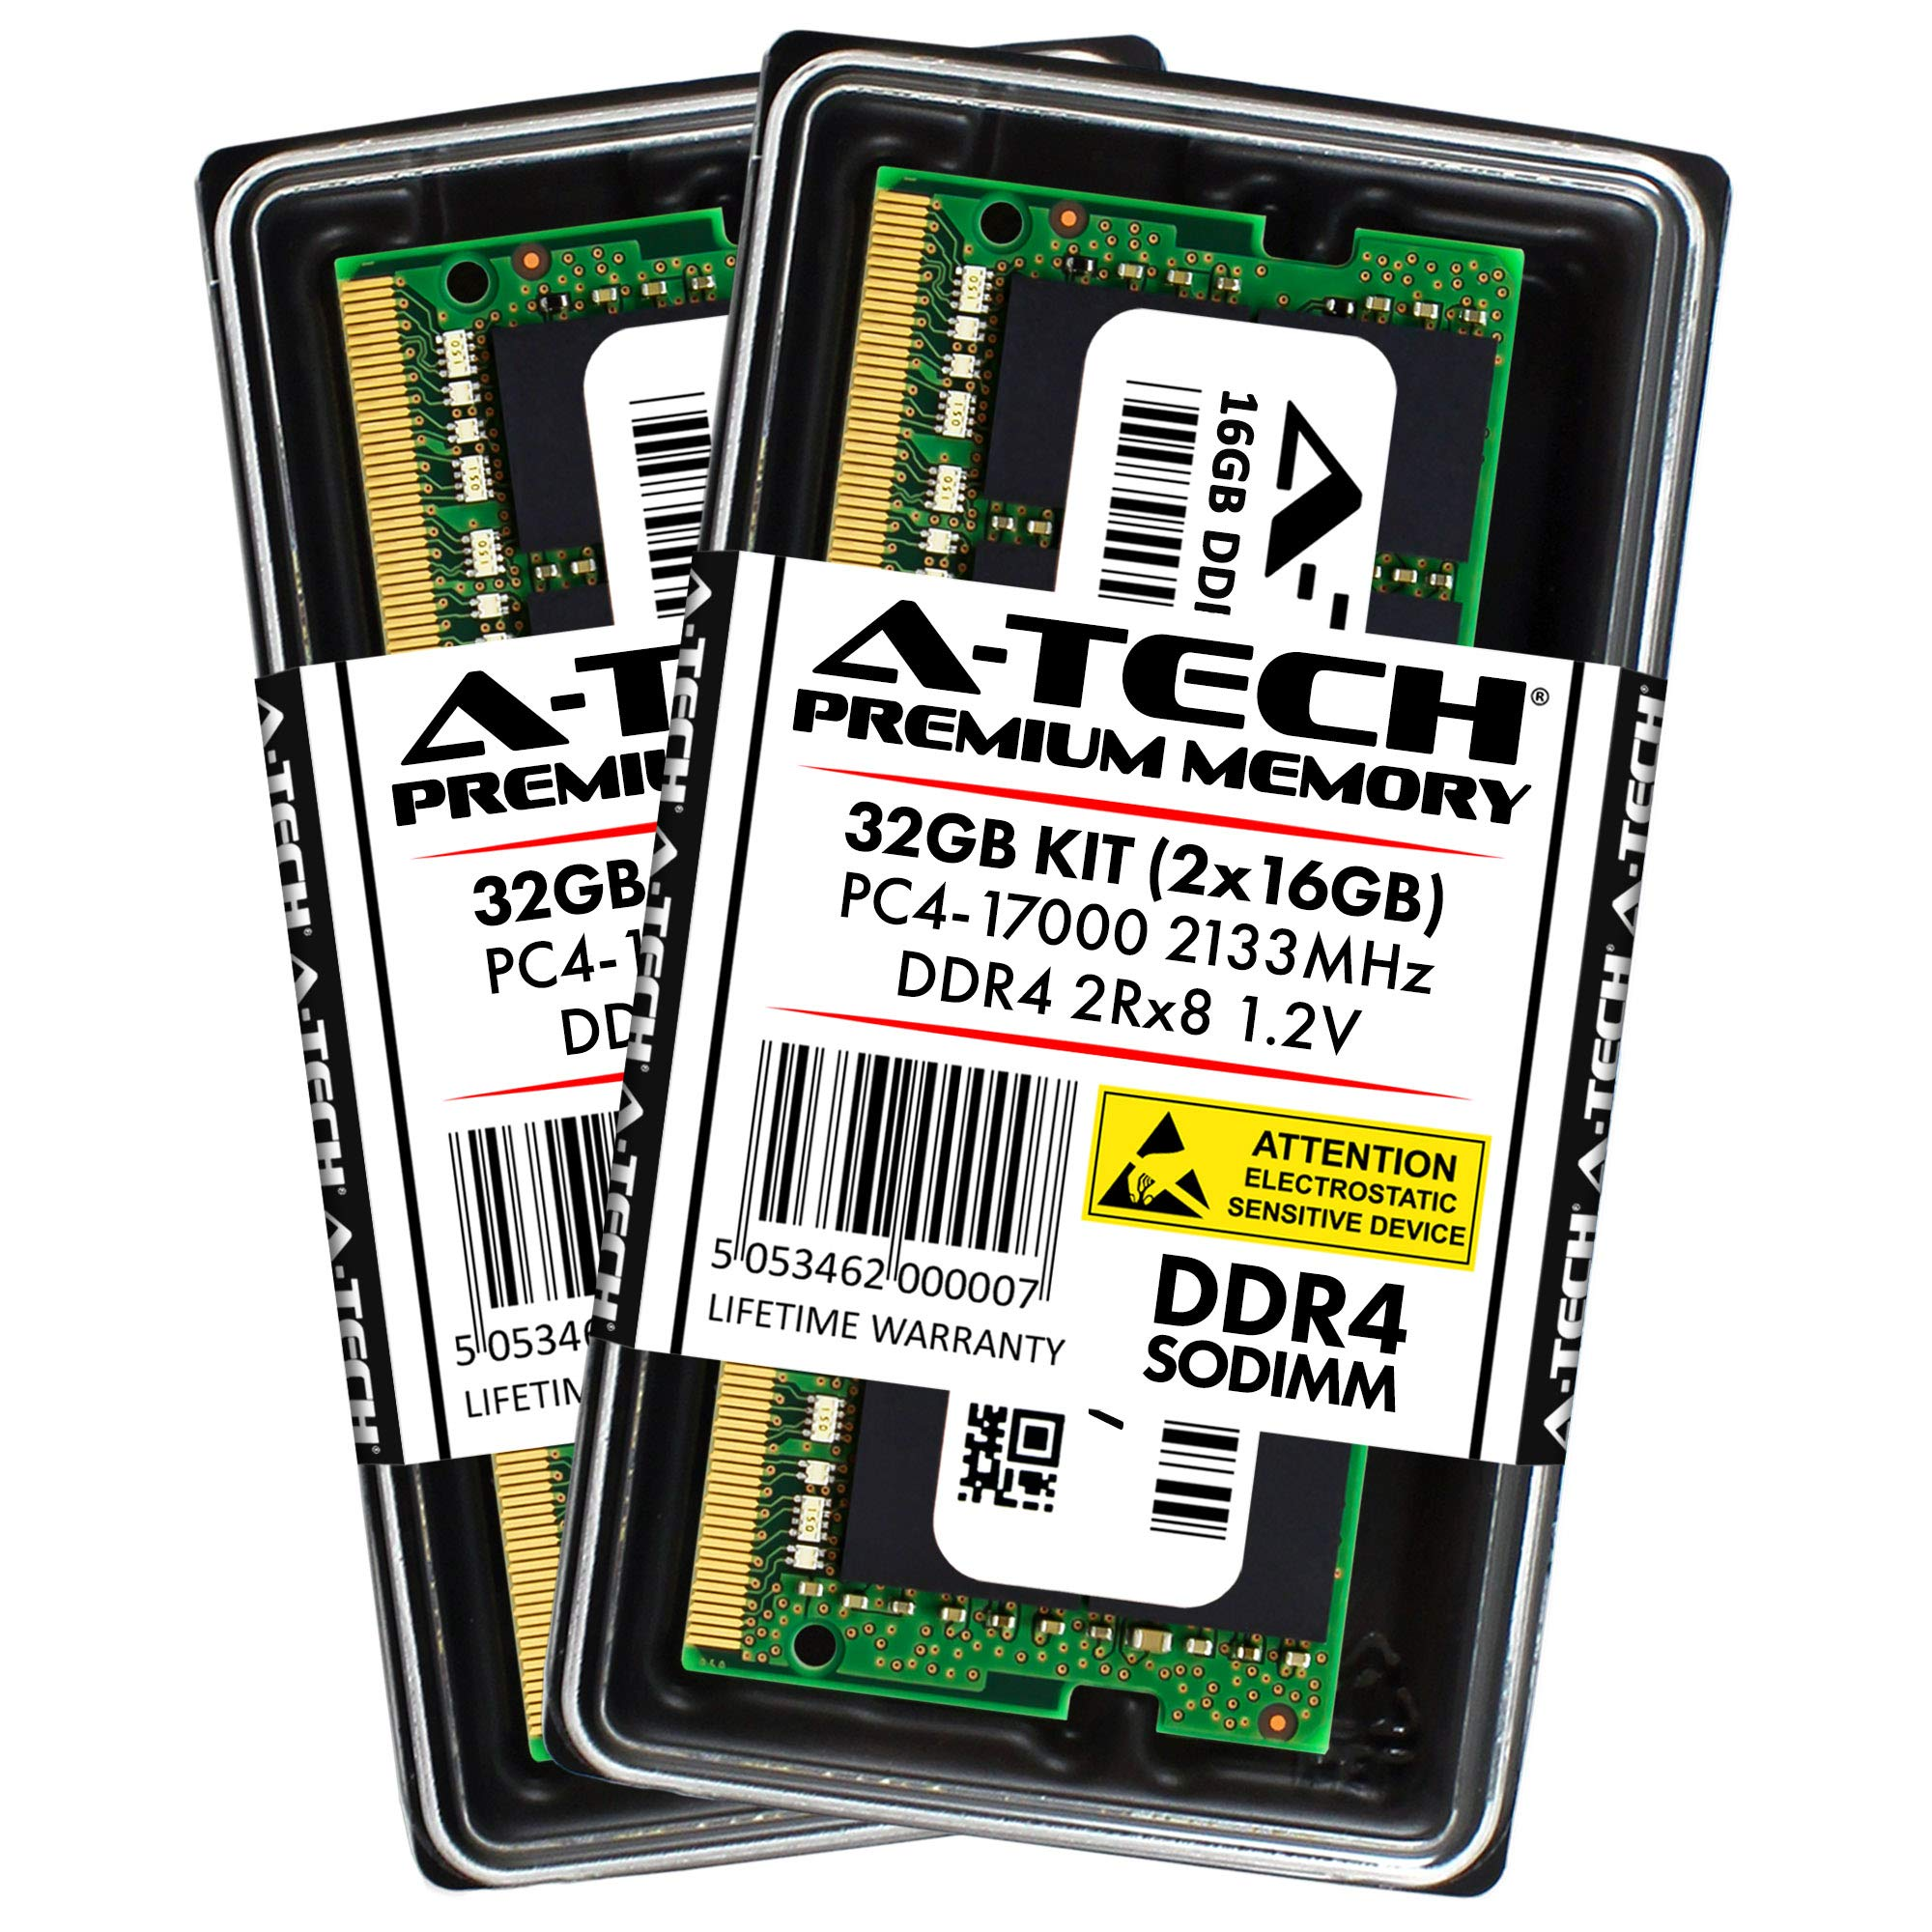 Memoria Ram 32GB A-Tech DDR4 2133MHz Kit (2 x 16GB) PC4-17000 Non-ECC Unbuffered SODIMM 260-Pin 2Rx8 1.2V Dual Ra